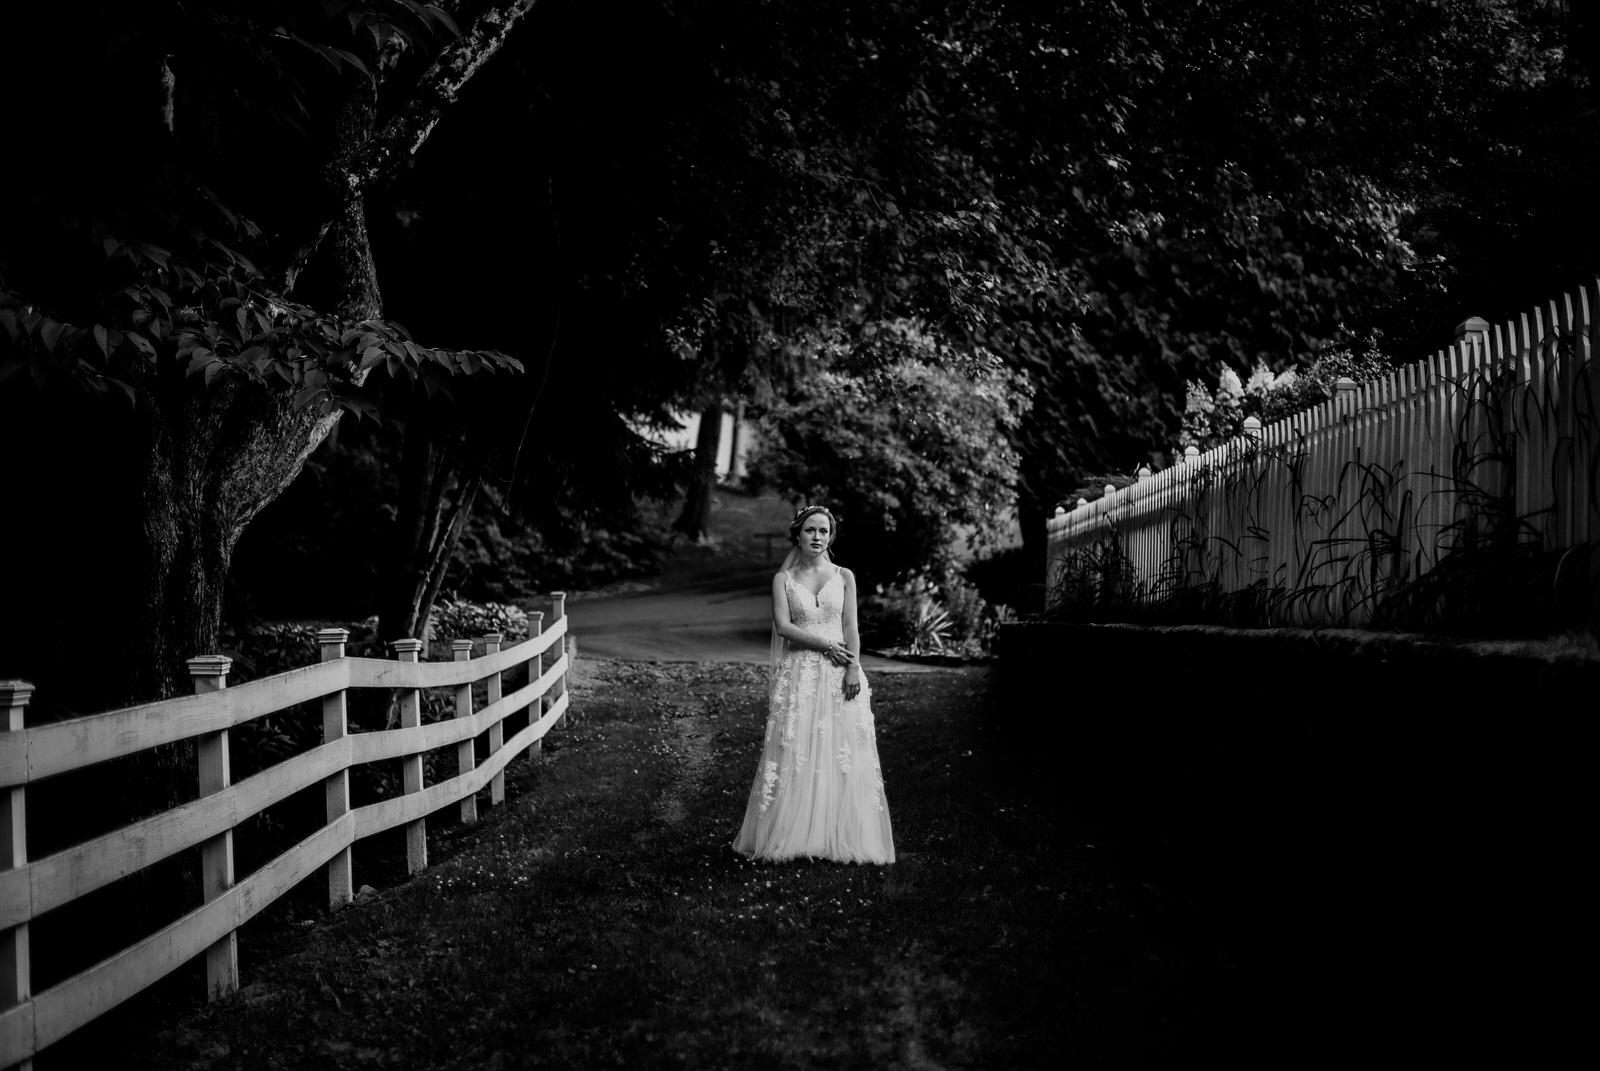 Inn-At-Tranquility-Farm-Bridal-Session-107.jpg